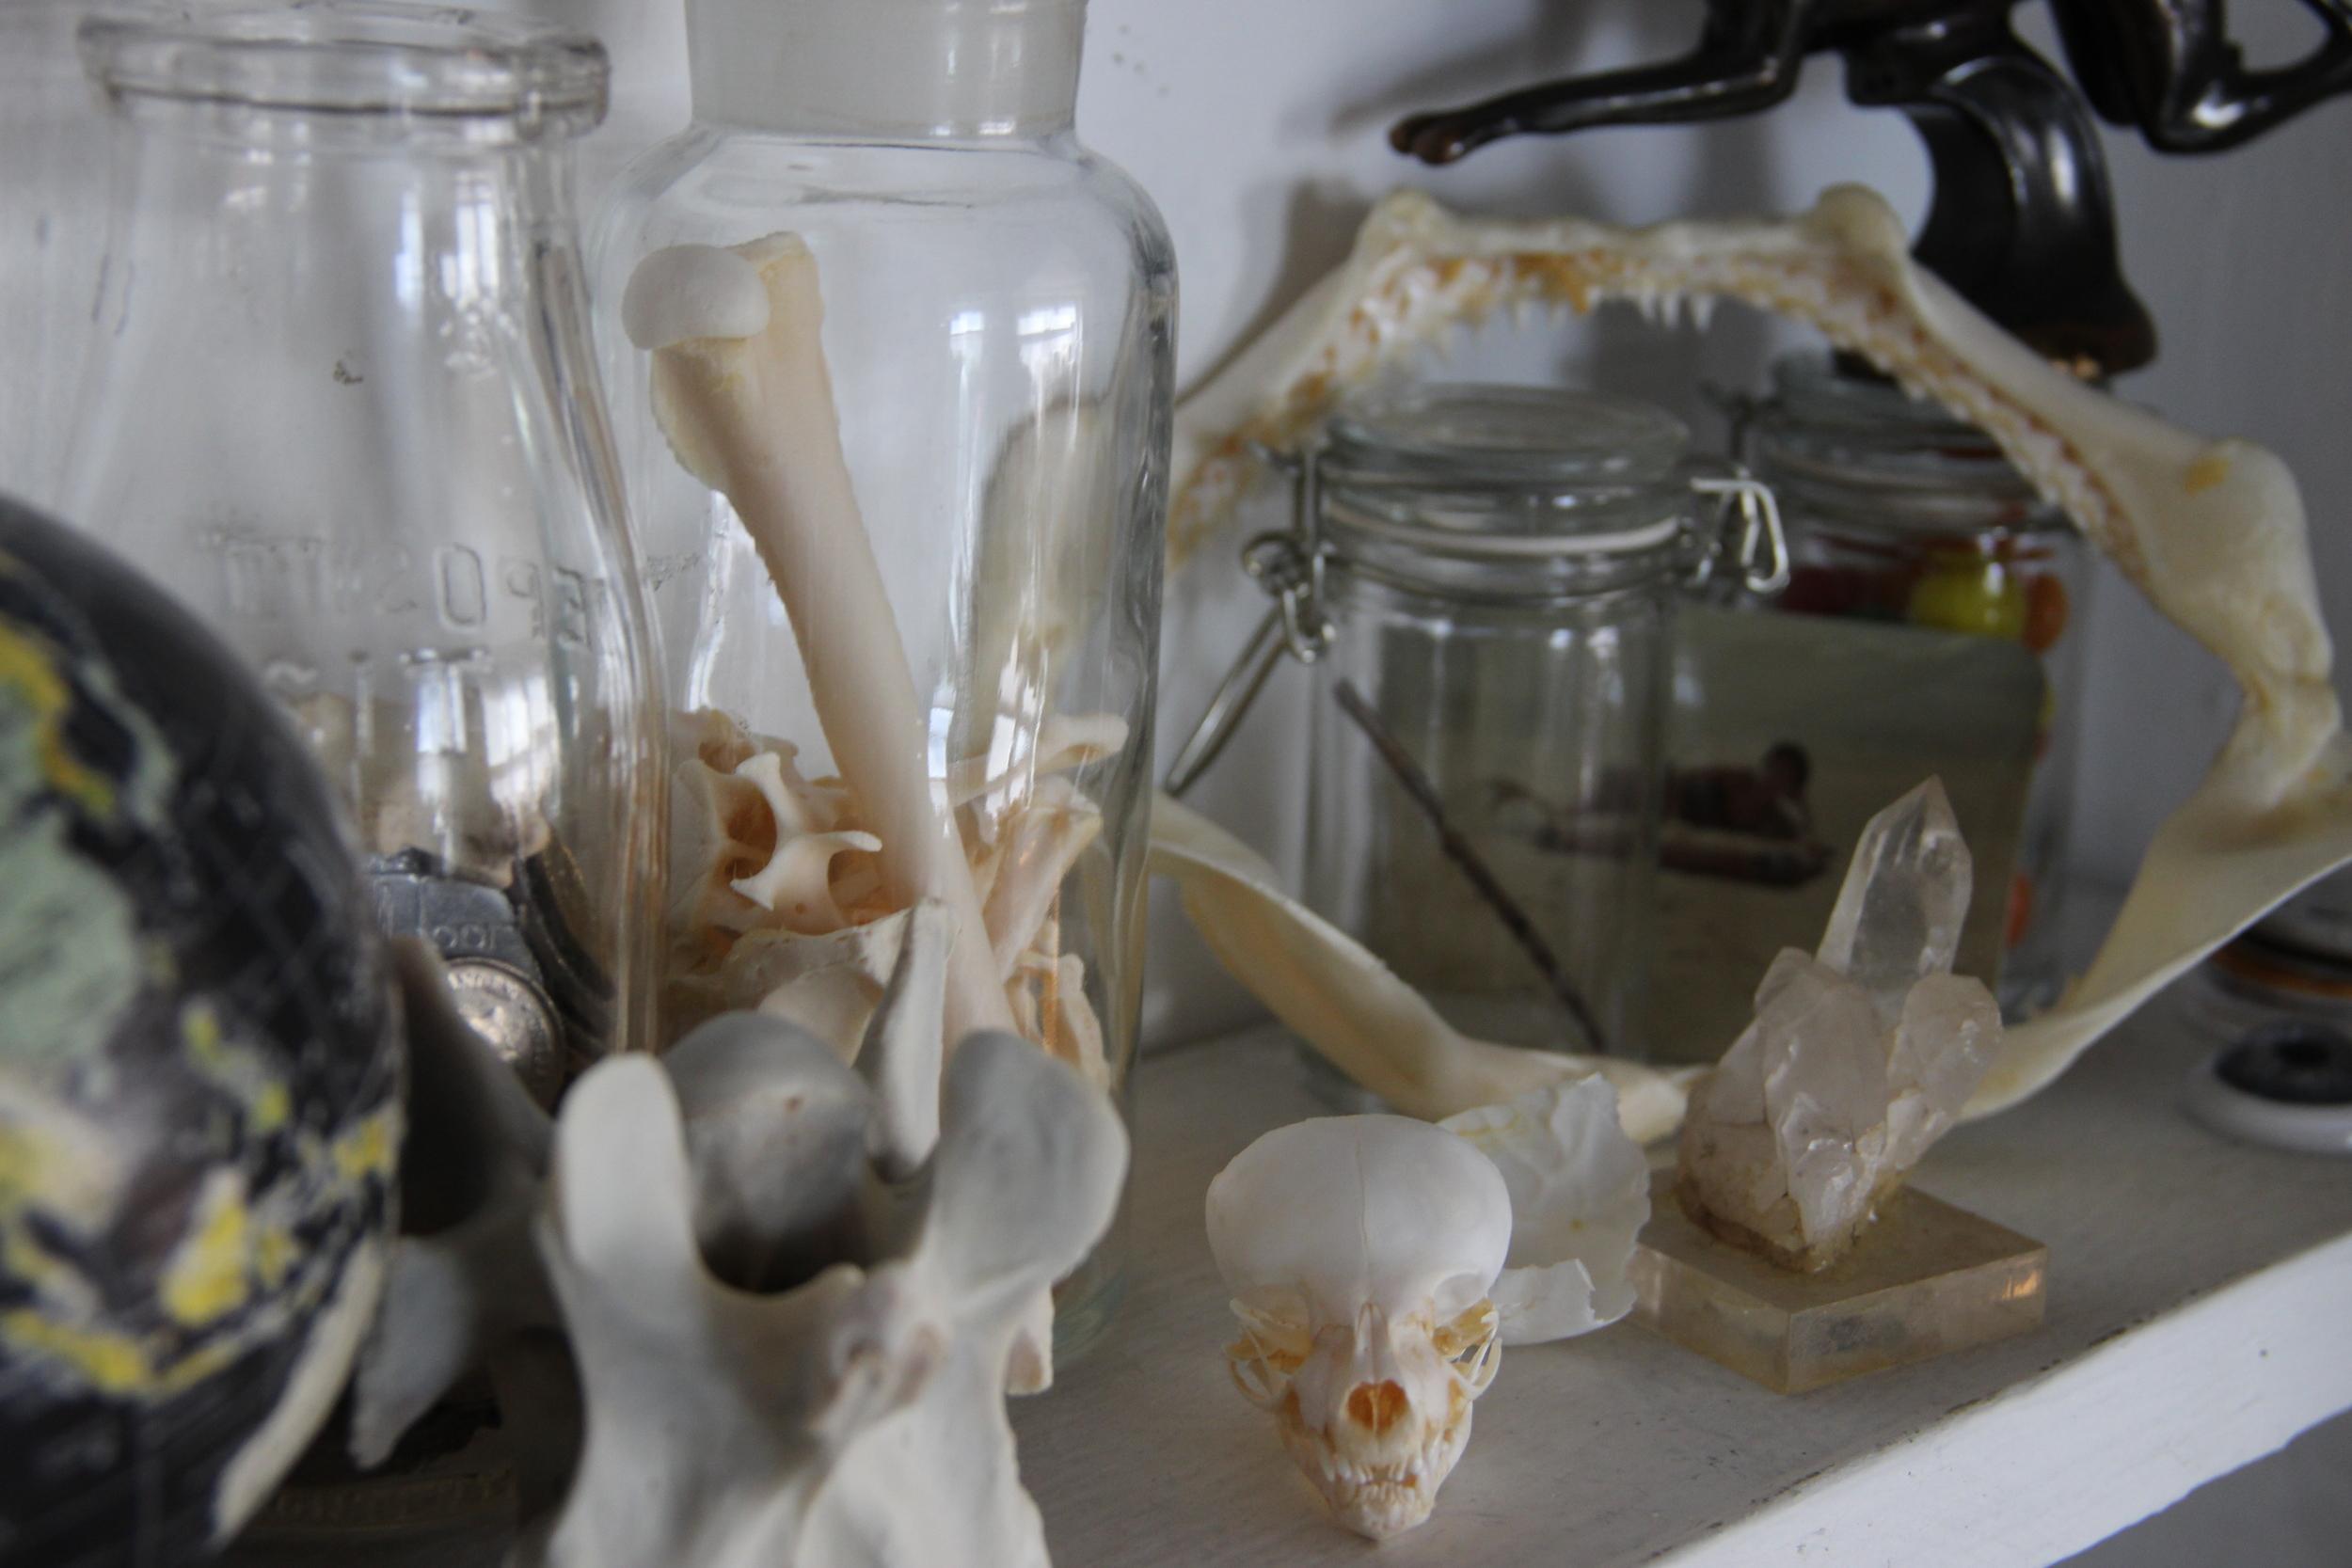 Kinkajou skull, whitetail vertebrae, shark jaws (from an antique store) and a jar of kangaroo bones.